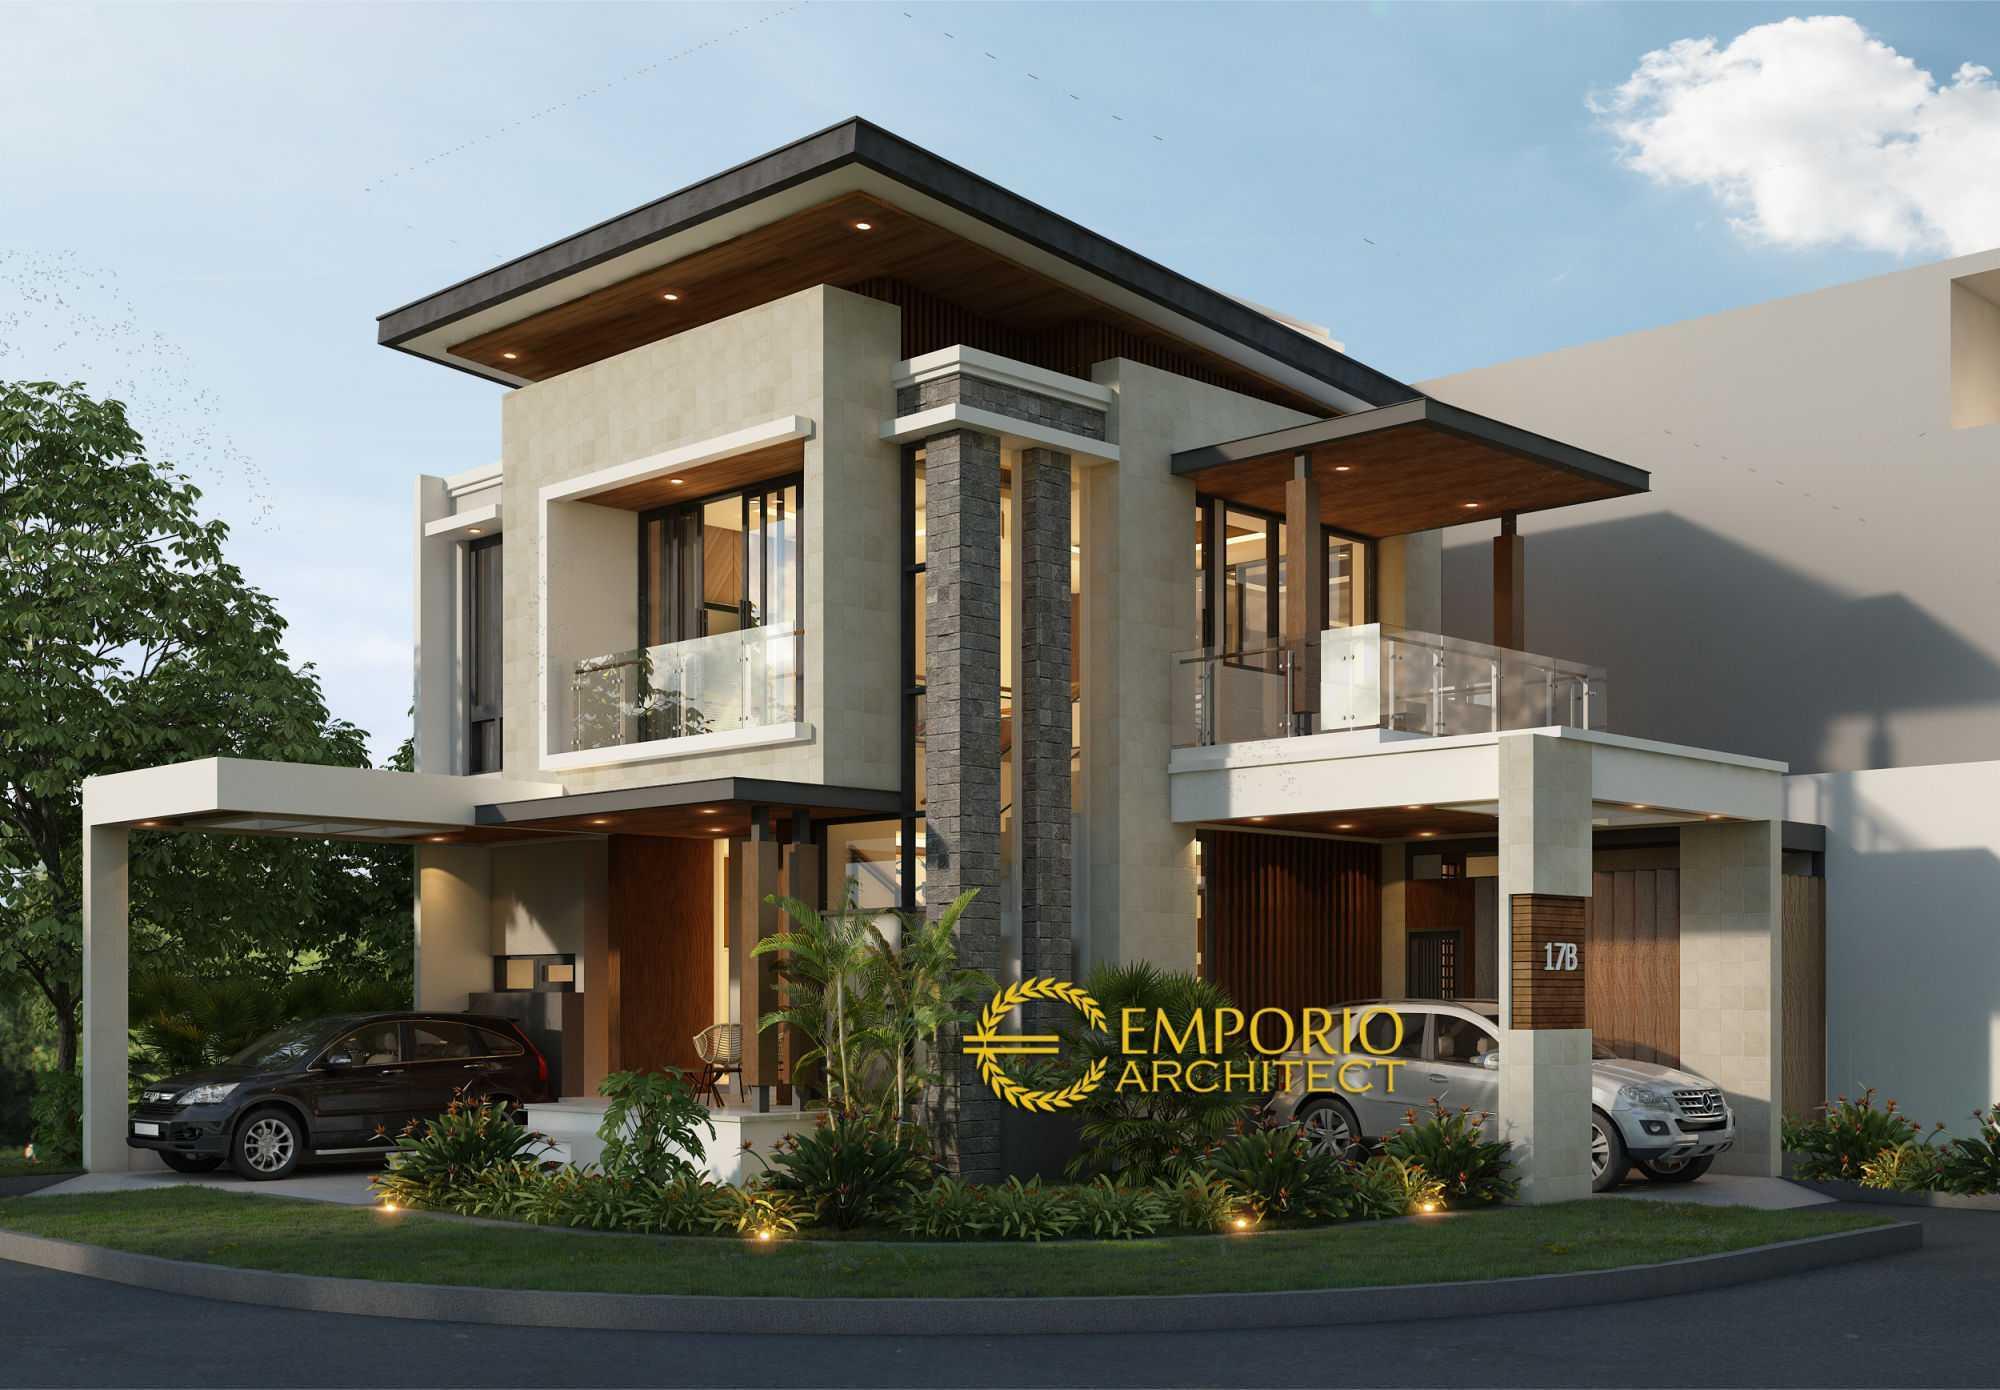 Emporio Architect Jasa Arsitek Cibubur Desain Rumah Modern Tropis 651 @ Cibubur, Ciracas, Jakarta Timur Cibubur, Kec. Ciracas, Kota Jakarta Timur, Daerah Khusus Ibukota Jakarta, Indonesia Cibubur, Kec. Ciracas, Kota Jakarta Timur, Daerah Khusus Ibukota Jakarta, Indonesia Emporio-Architect-Jasa-Arsitek-Cibubur-Desain-Rumah-Modern-Tropis-651-Cibubur-Ciracas-Jakarta-Timur   79988